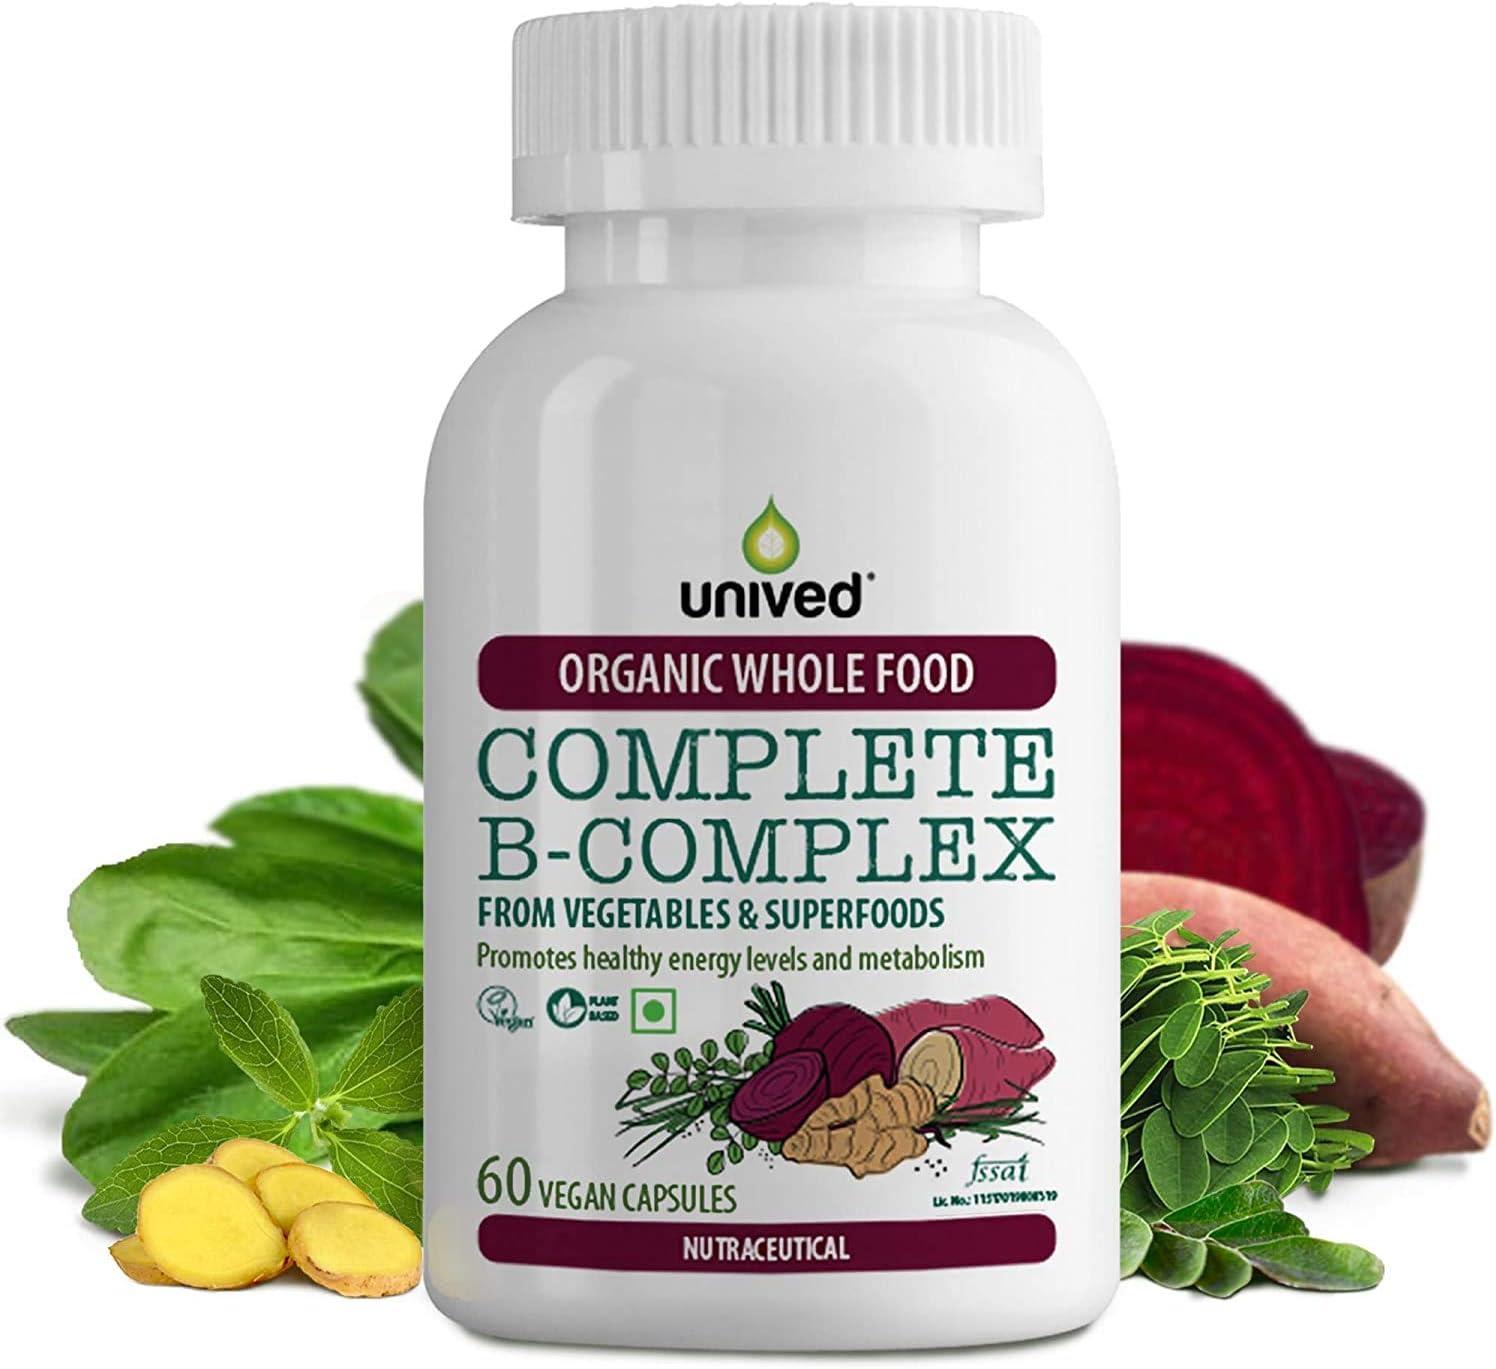 Dharma Unived Organic Vitamin B Complex, Whole Food Plant Based Vitamins B1, B2, B3, B6, Folate, B12, Biotin, B5, for Energy, Skin & Hair Health, 60 Vegan Capsules